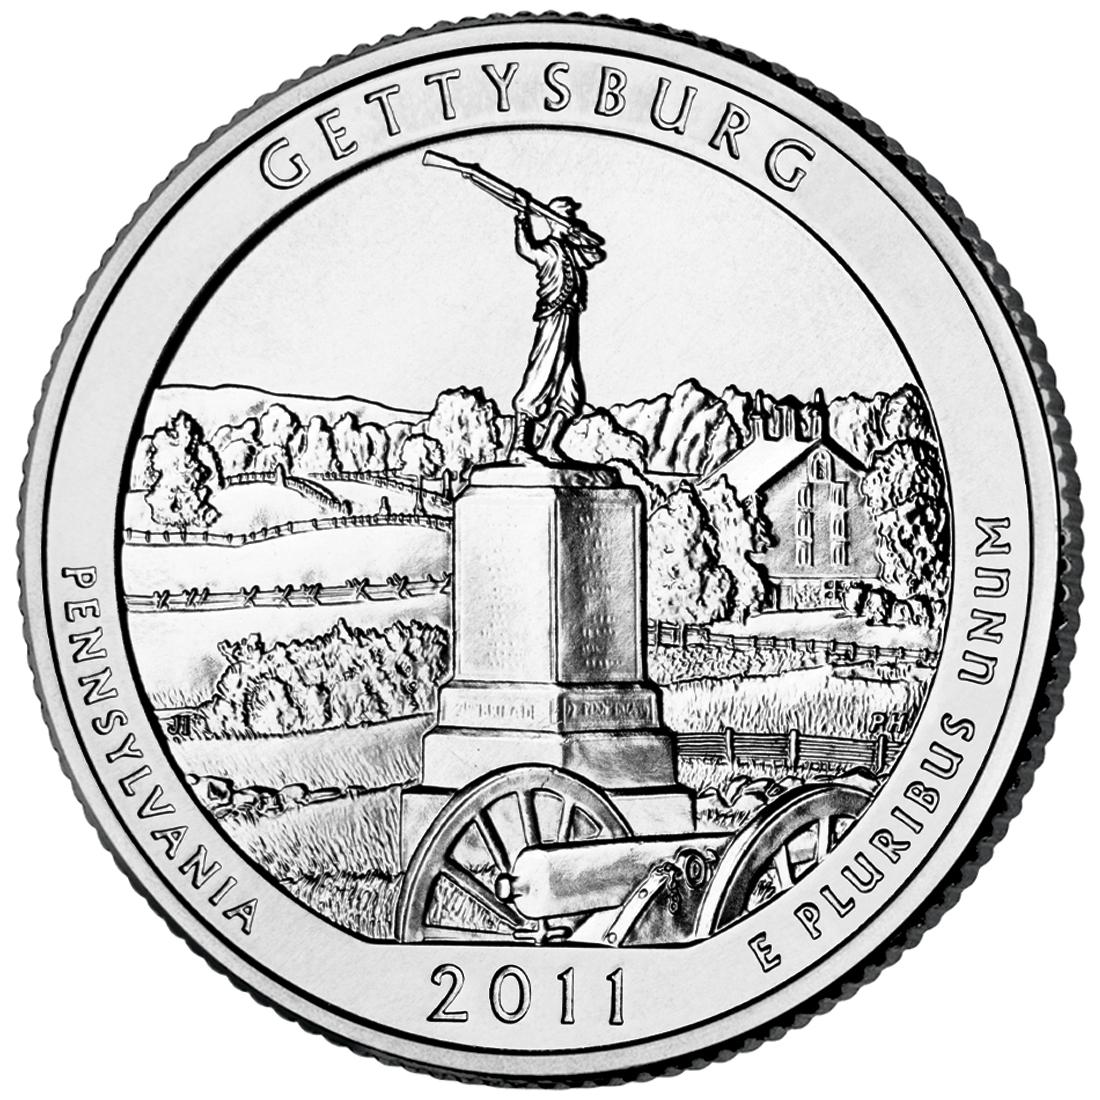 National military park quarter. Battle clipart battle gettysburg